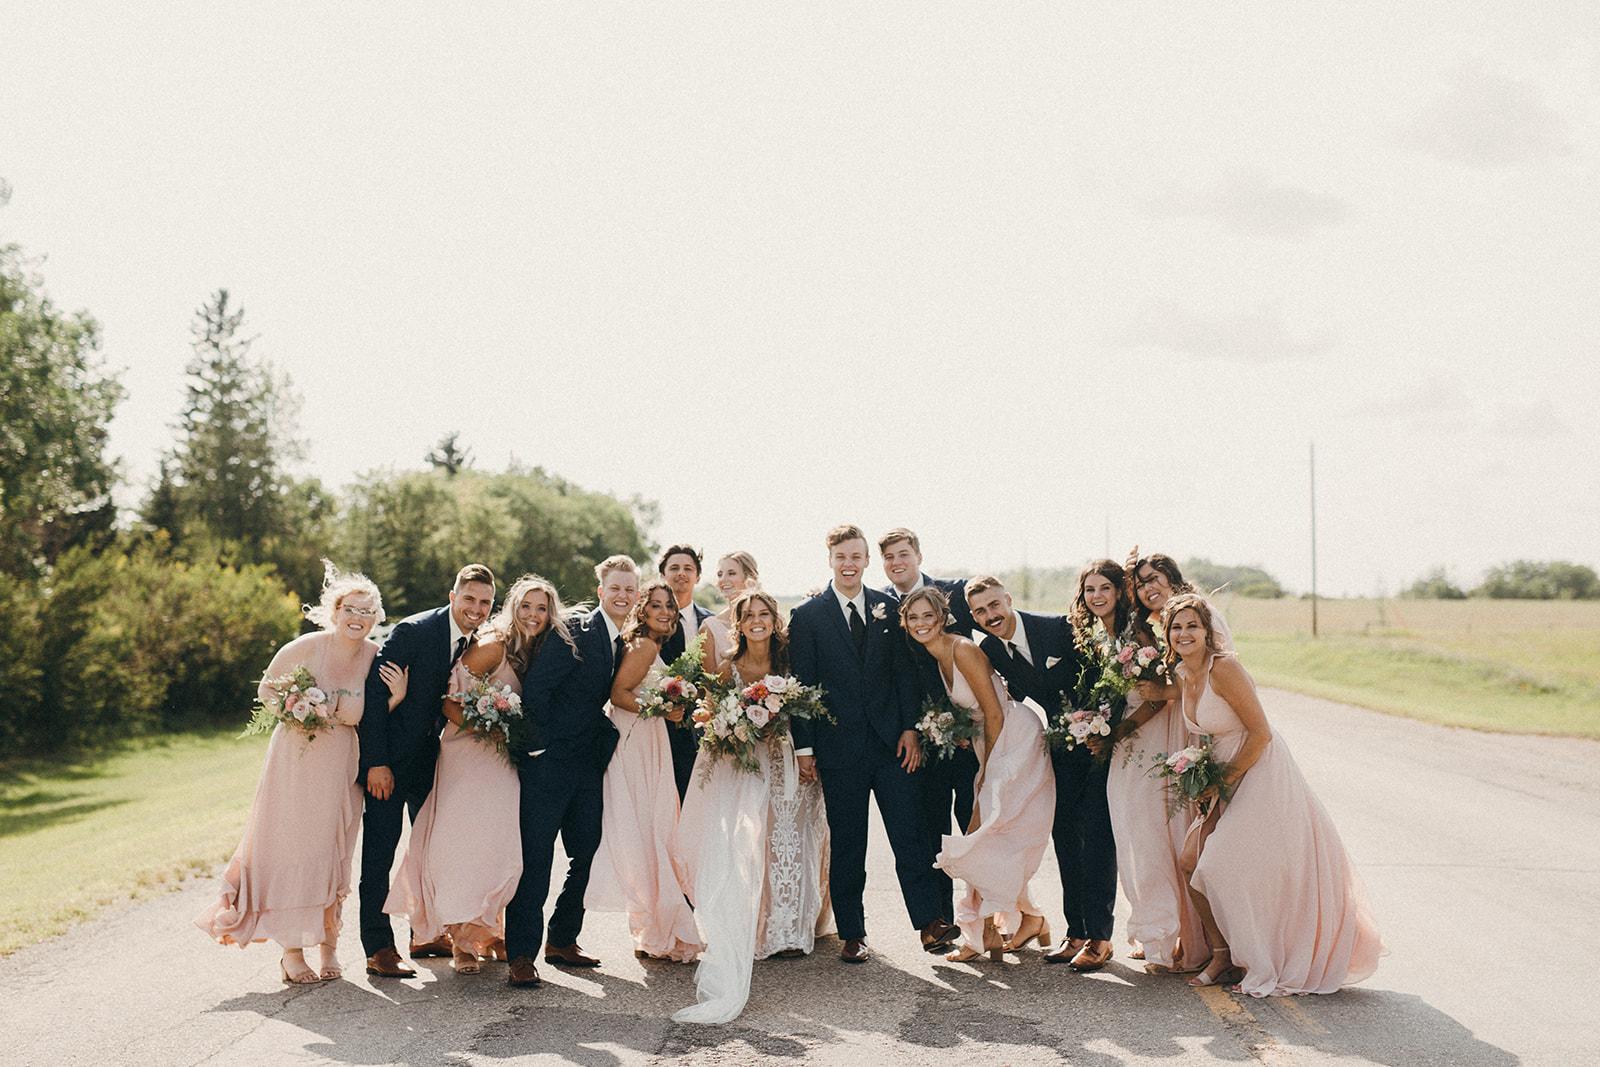 kaden_justine_wedding_1836.jpg